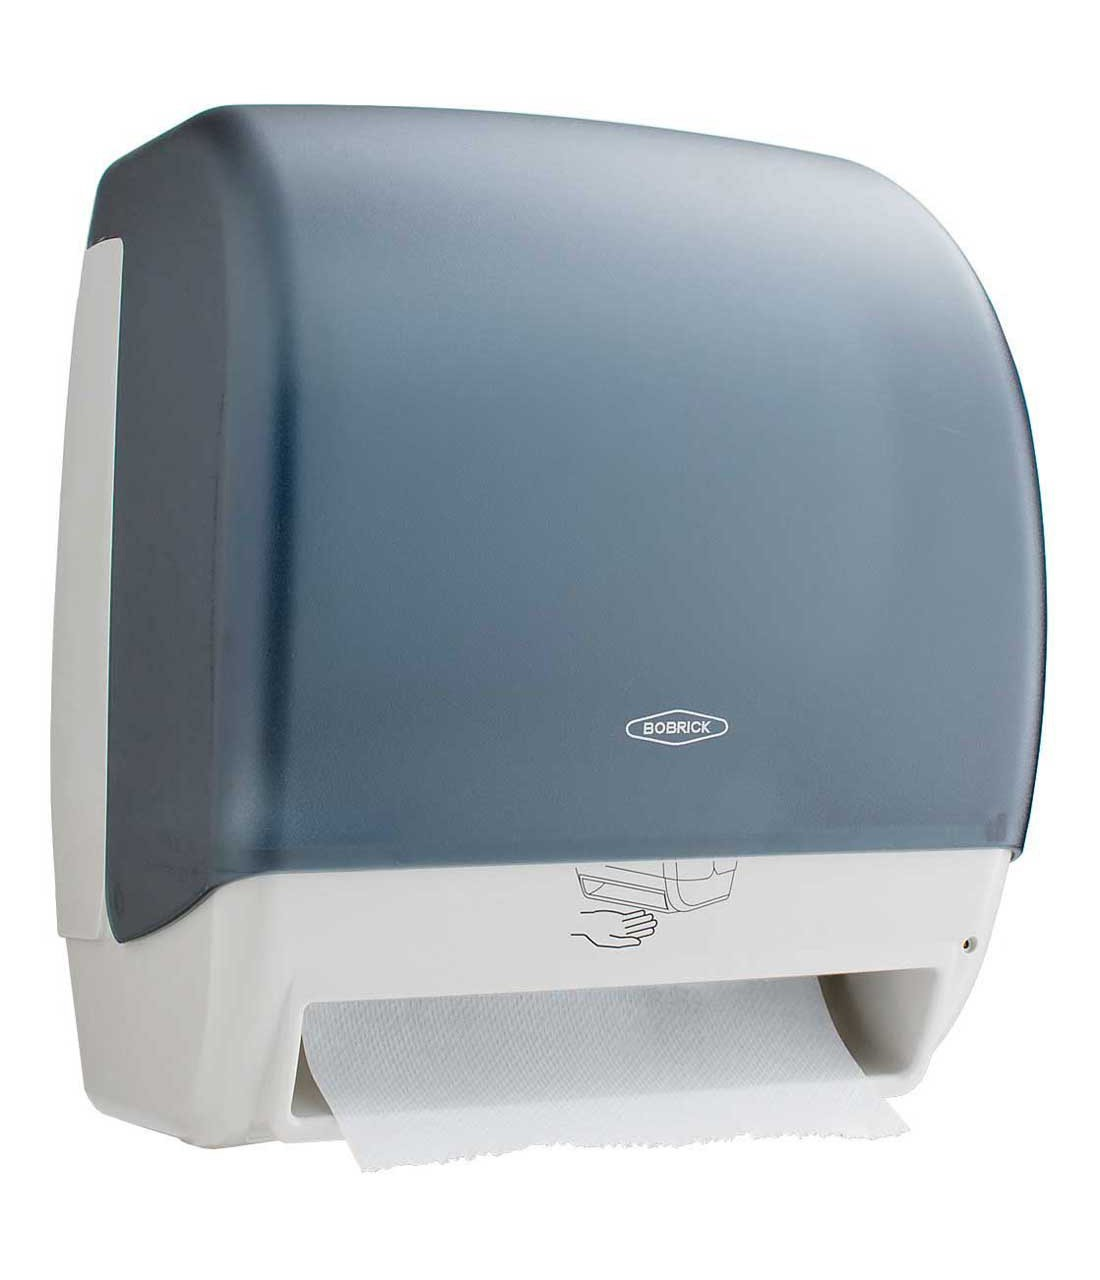 bobrick b72974 automatic paper towel dispenser ada towel dispenser - Paper Towel Dispenser